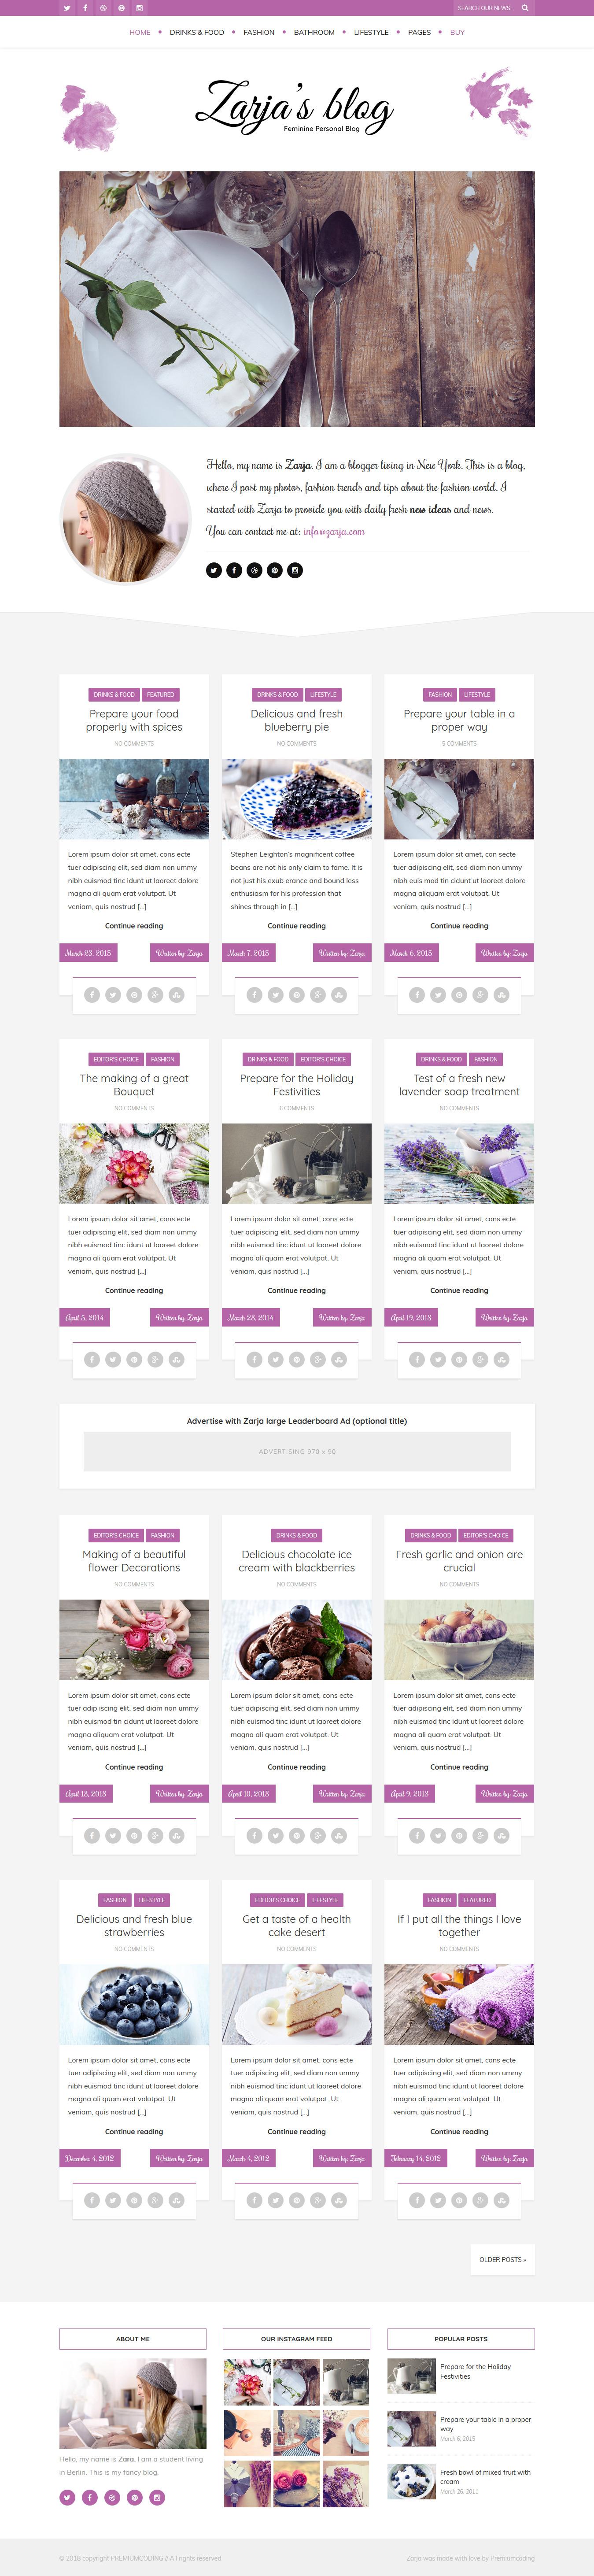 zarja blog best premium feminine wordpress theme - 10+ Best Feminine WordPress Themes (Premium Version)